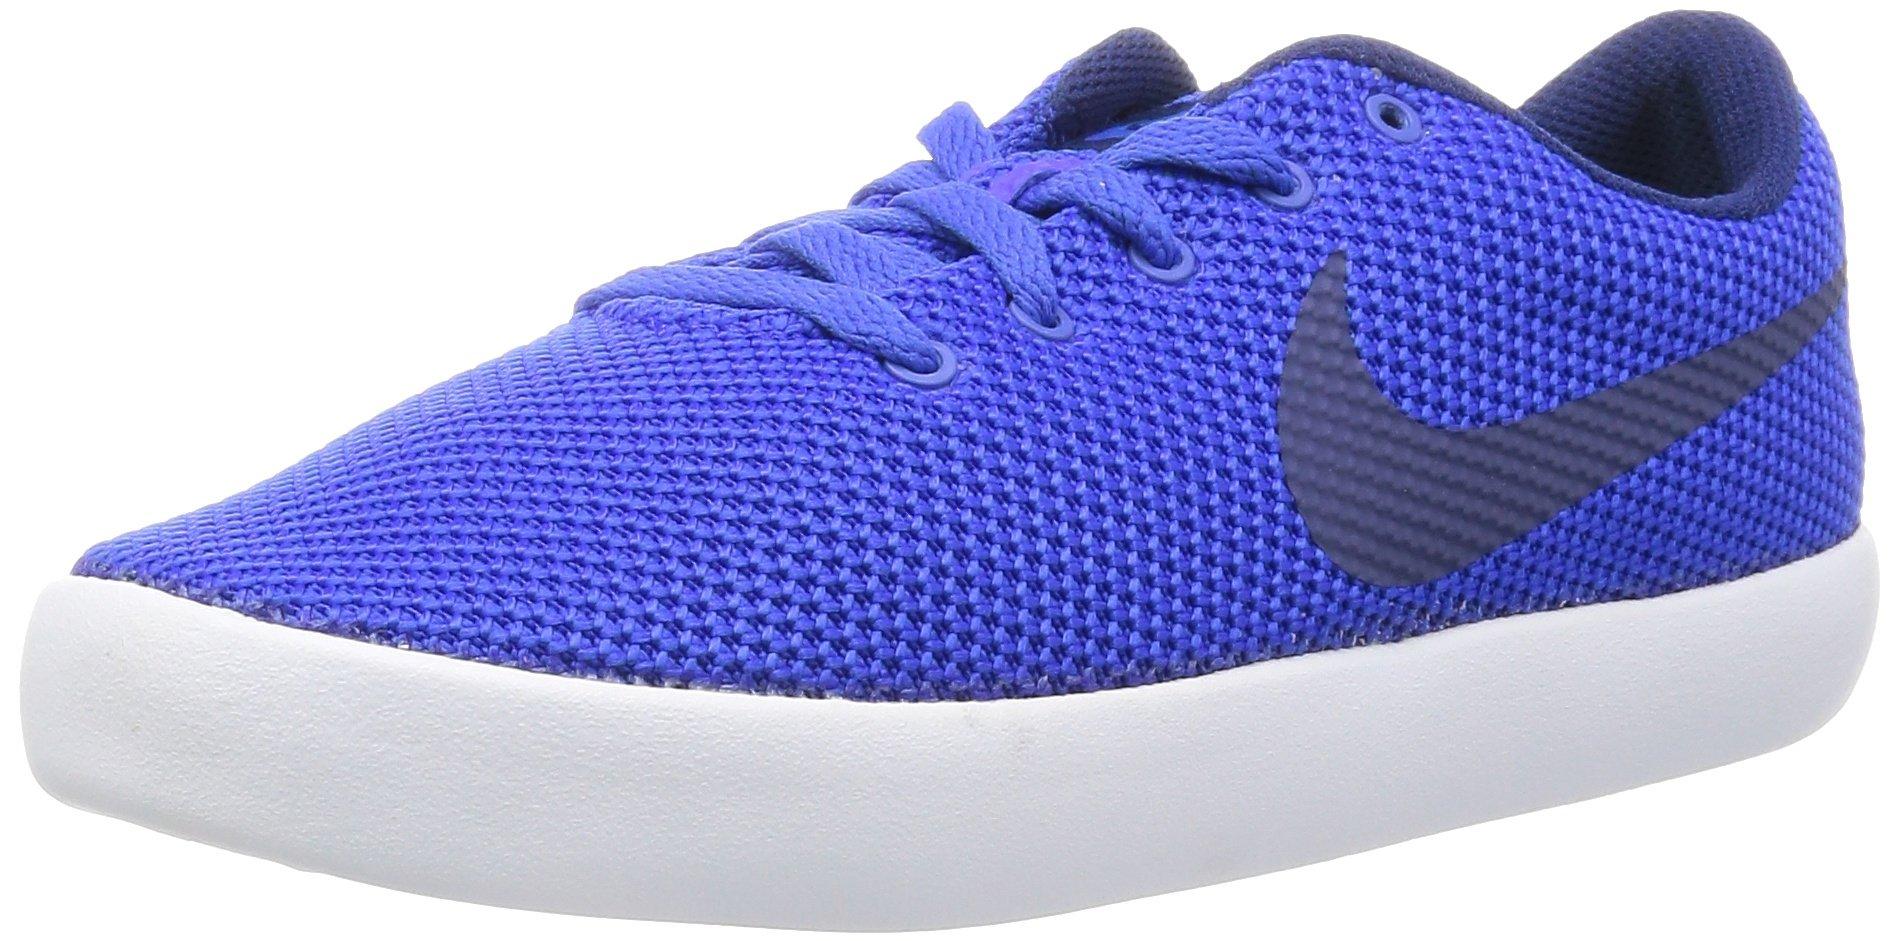 Nike Mens Essentialist Racer Blue Royal Blue White